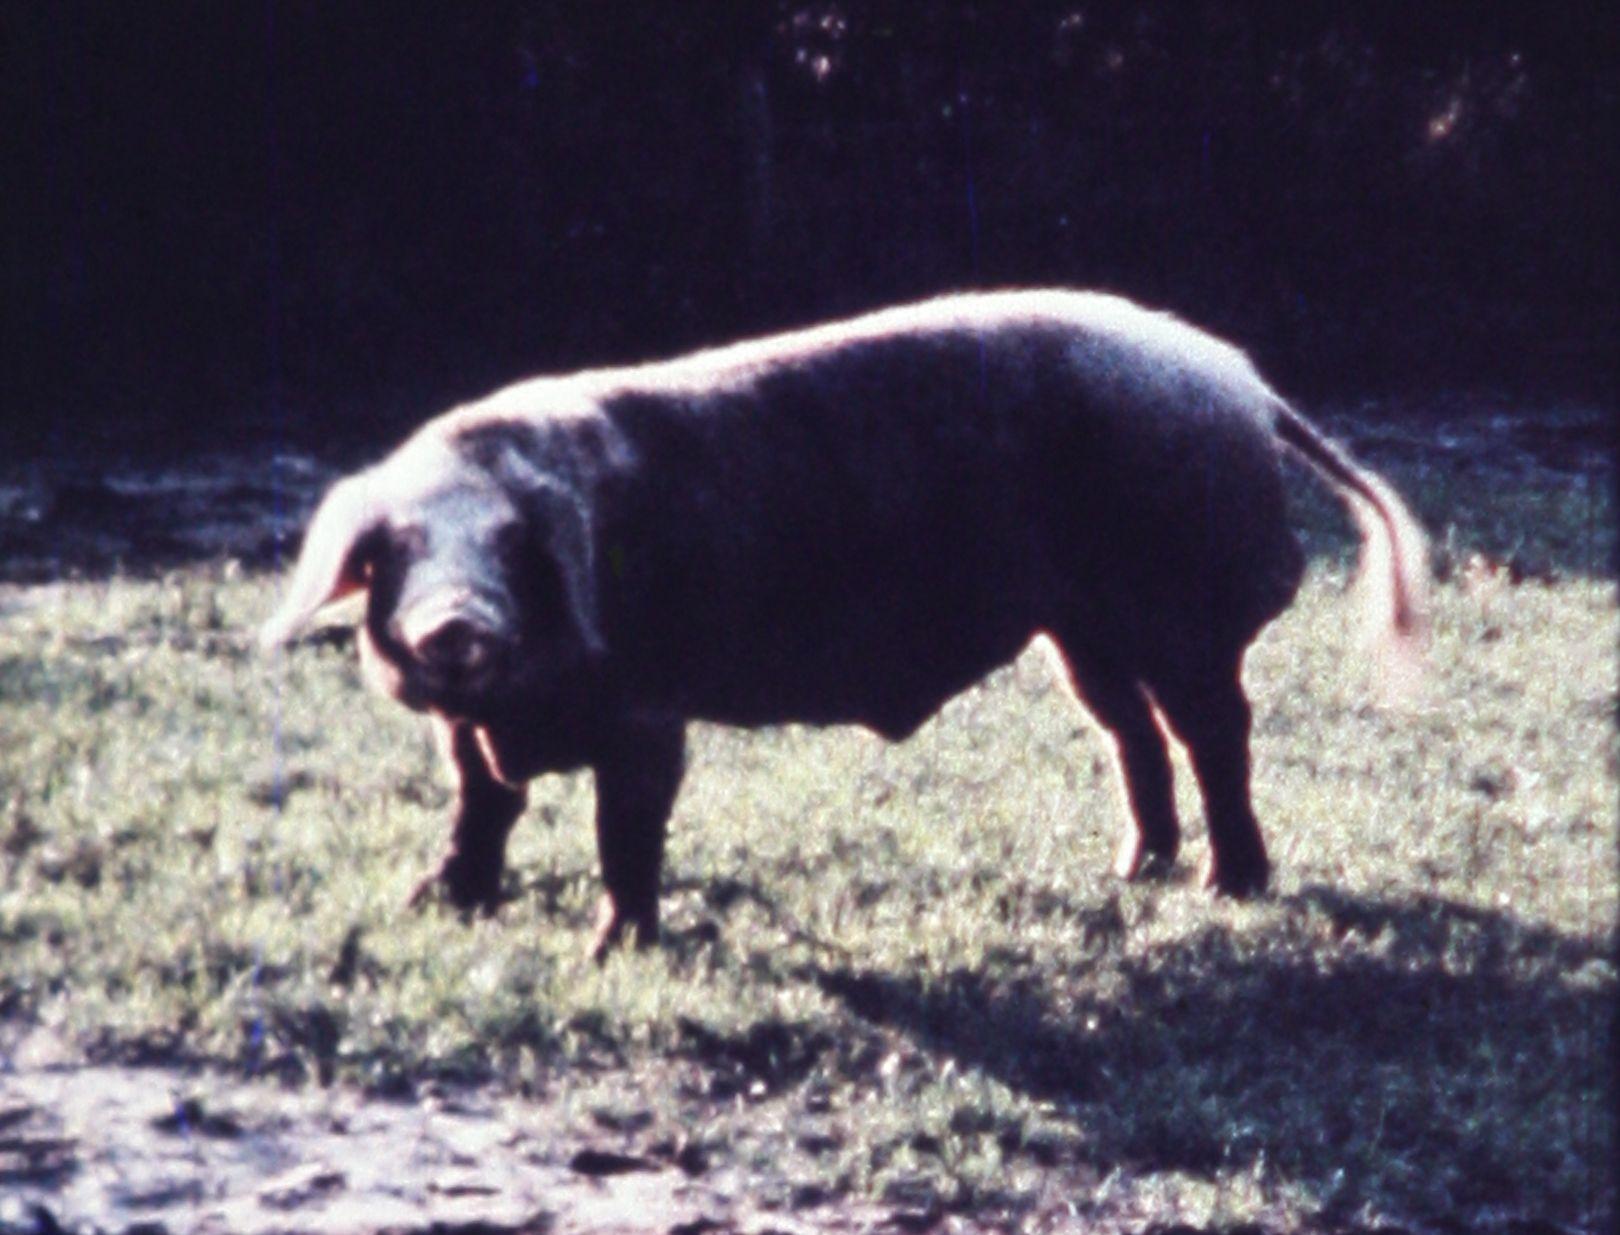 Margaret Raspé, Schweineschnitzel (Pork Schnitzel), 1971, Super 8 transferred to blu-ray, color, silent 04:00 min Courtesy: Galerie Emanuel Layr